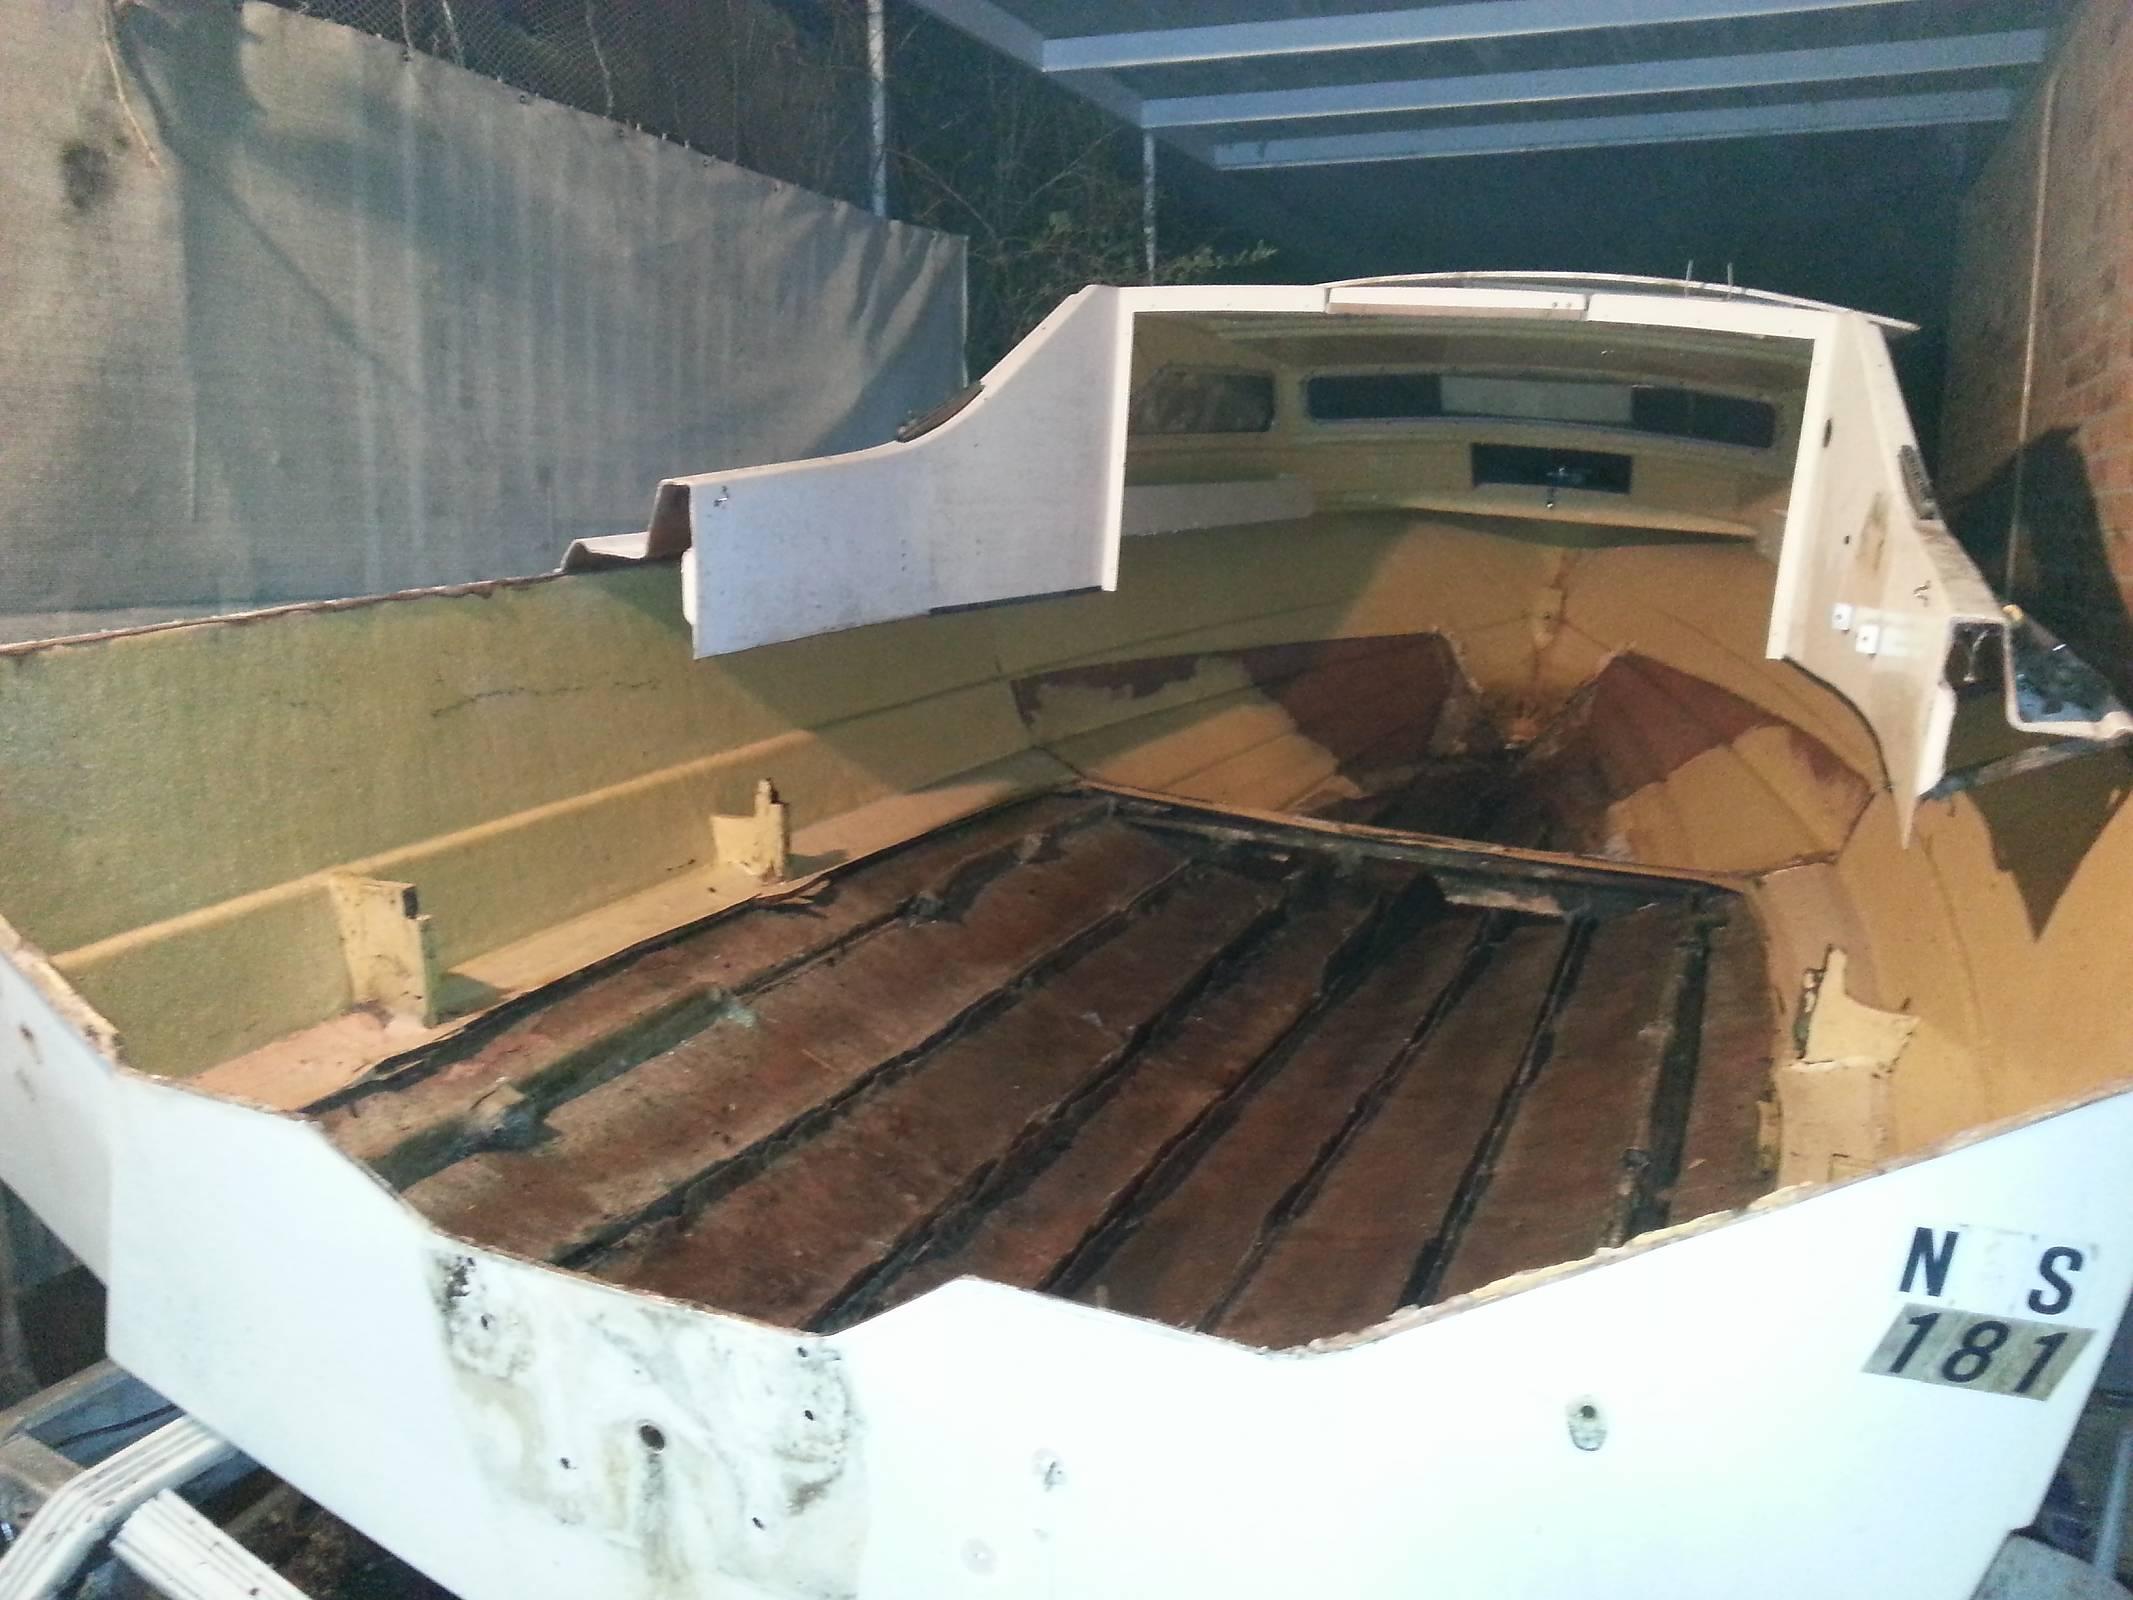 20ft Fibreglass boat repairs help & advice needed   Boat Design Net